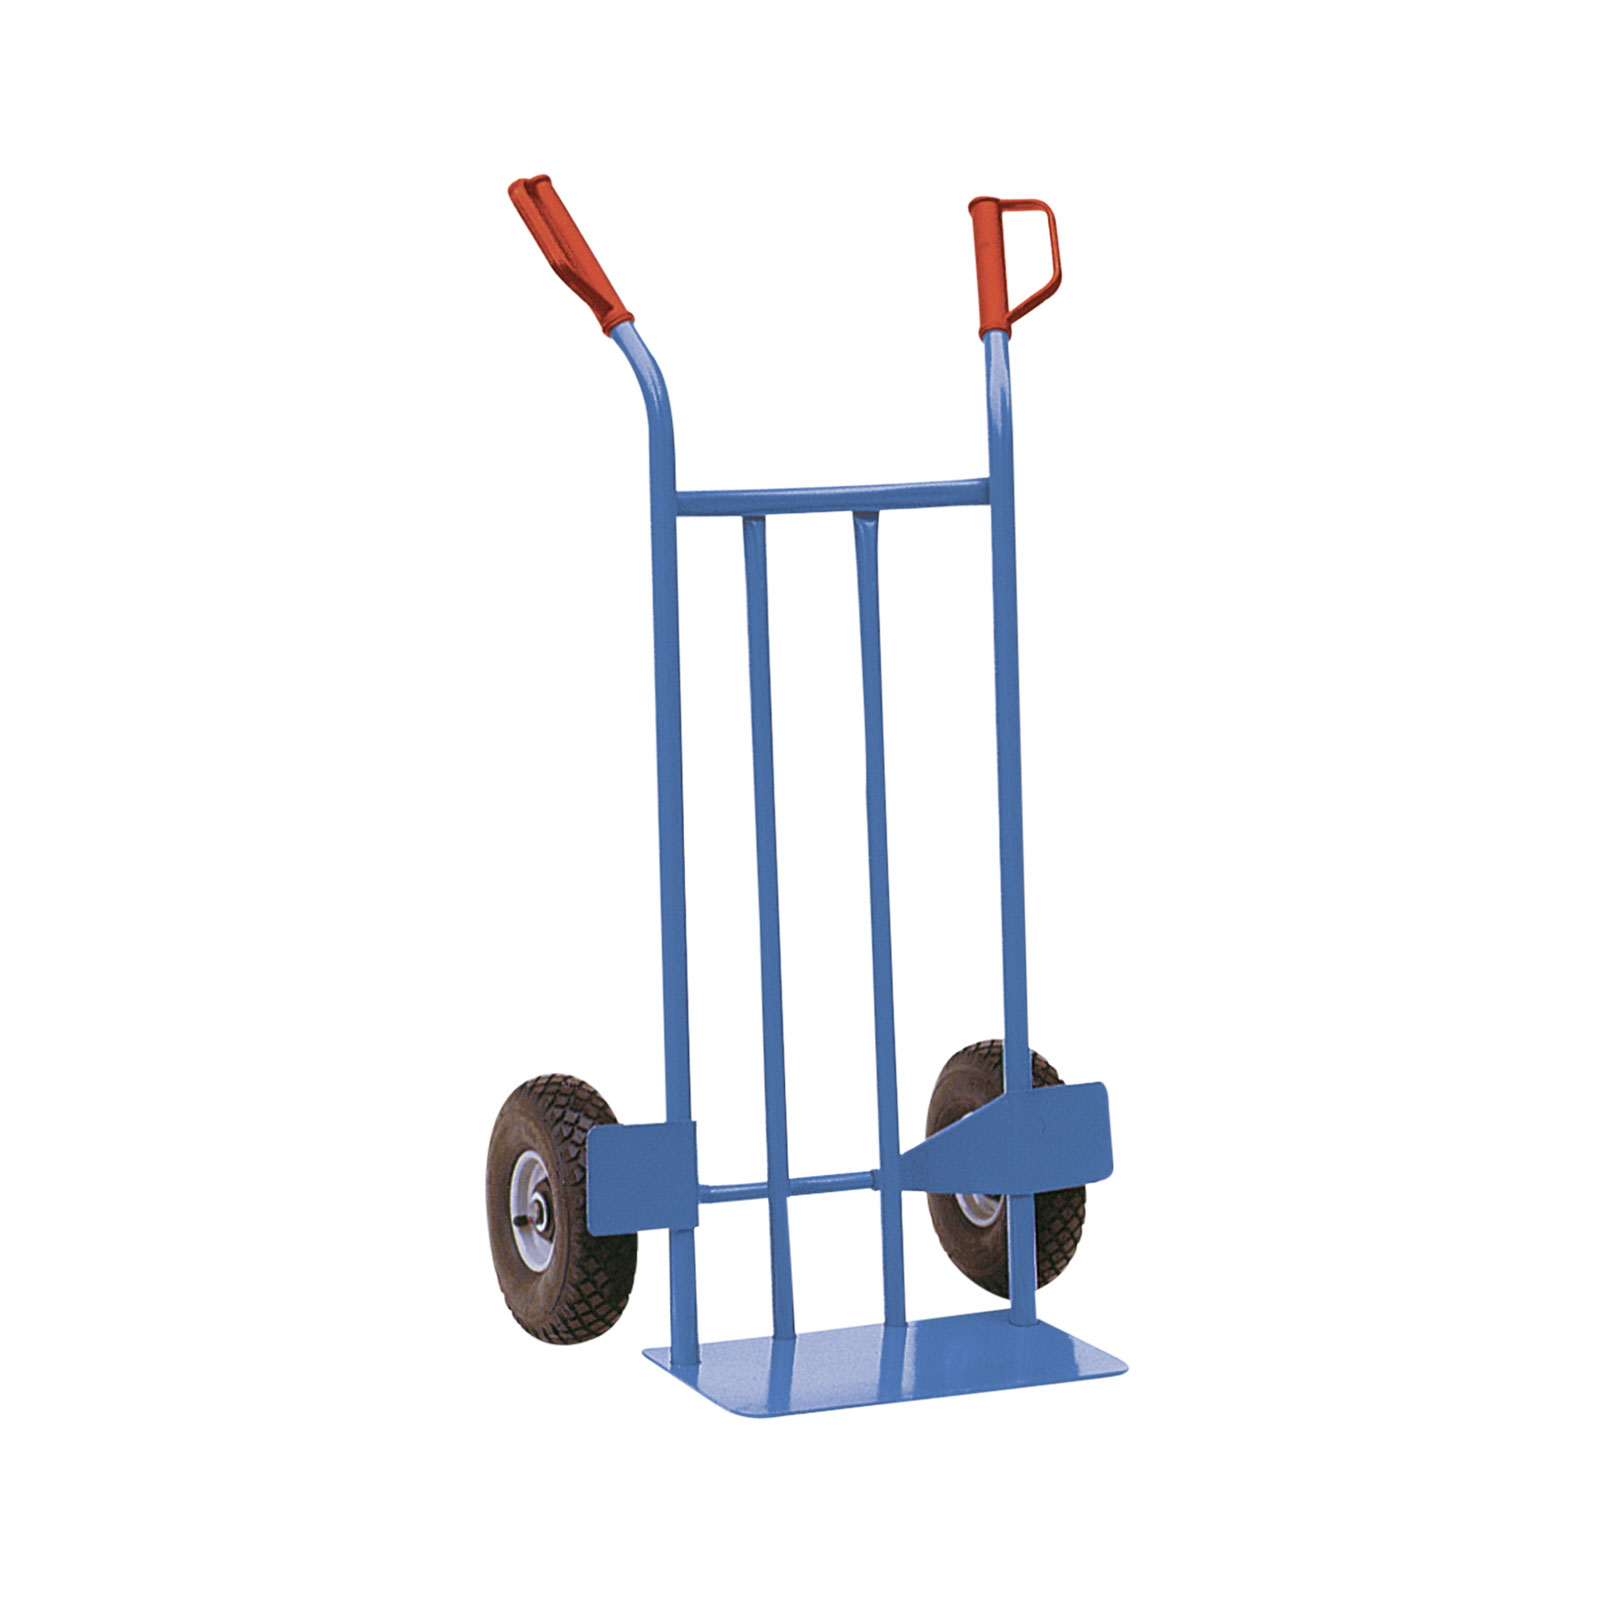 Schake Stahlrohrsackkarre 300kg Tragkraft 400x160mm Luftrad 51901